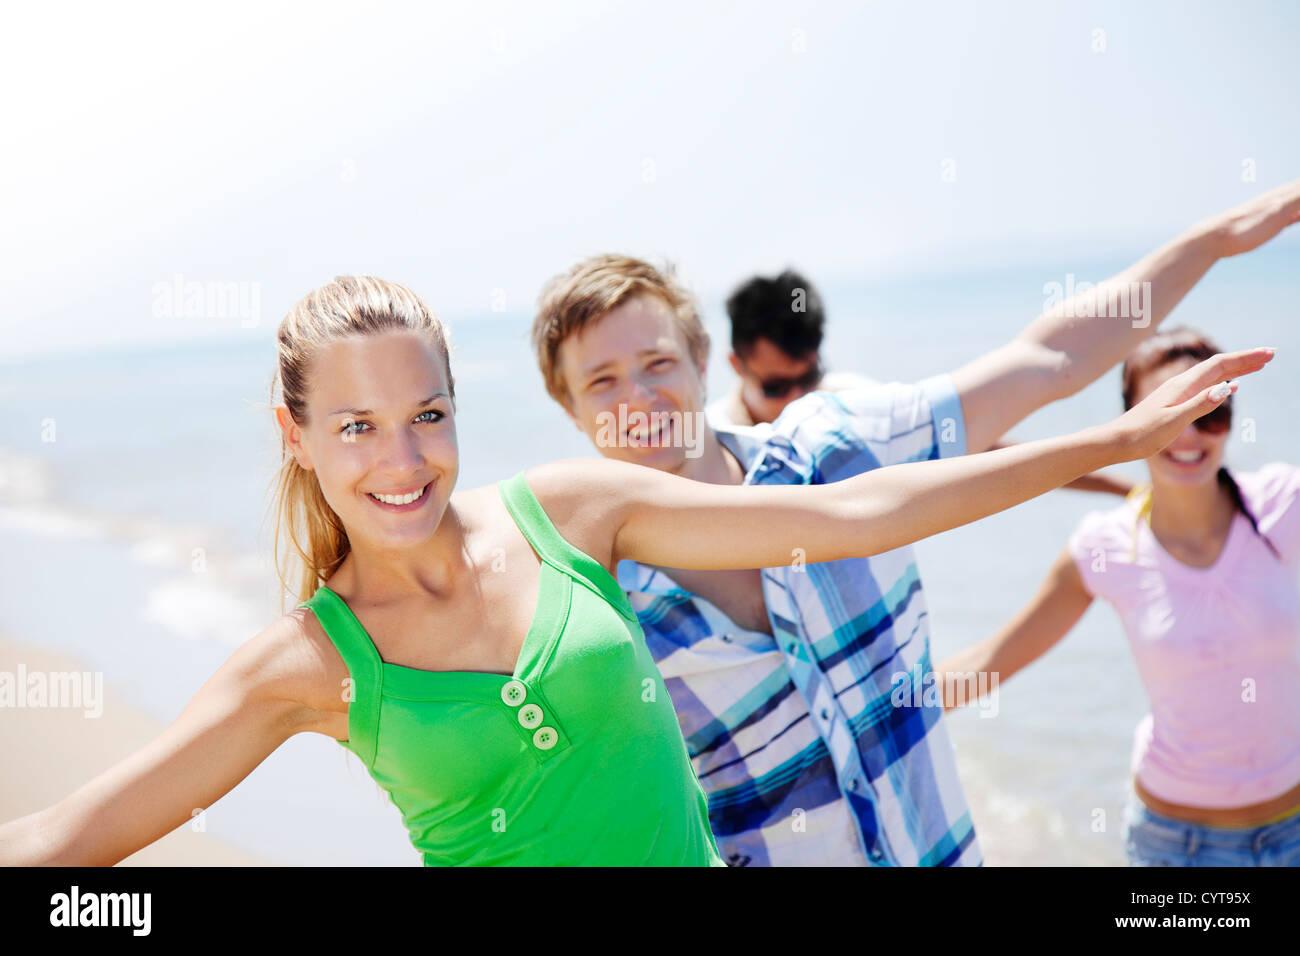 vitality - Stock Image